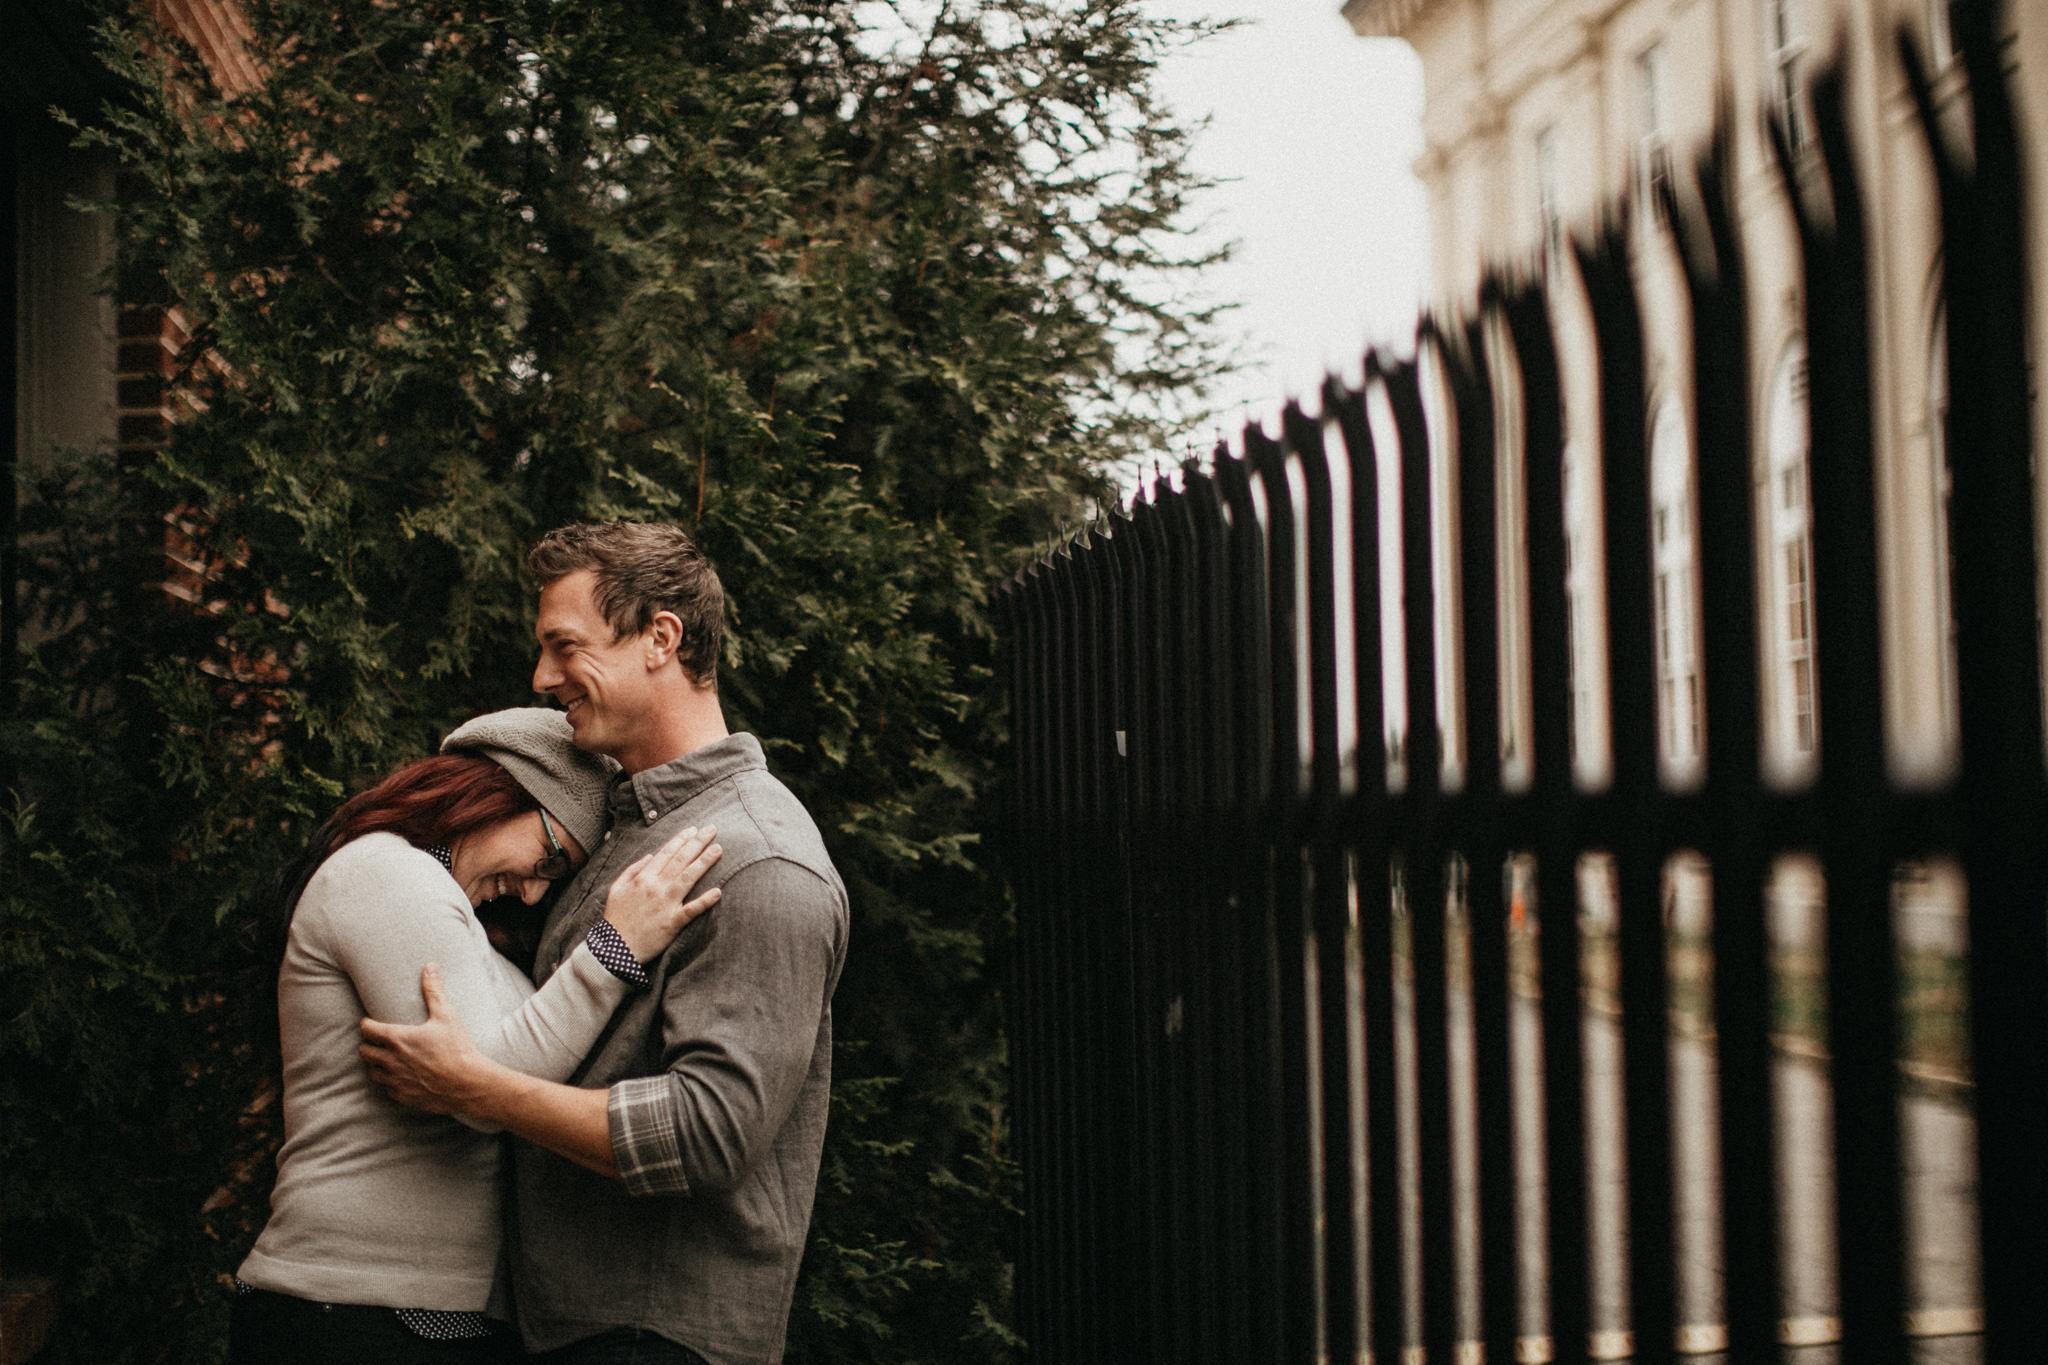 Virginia Engagement Photographer - Pat Cori.jpg